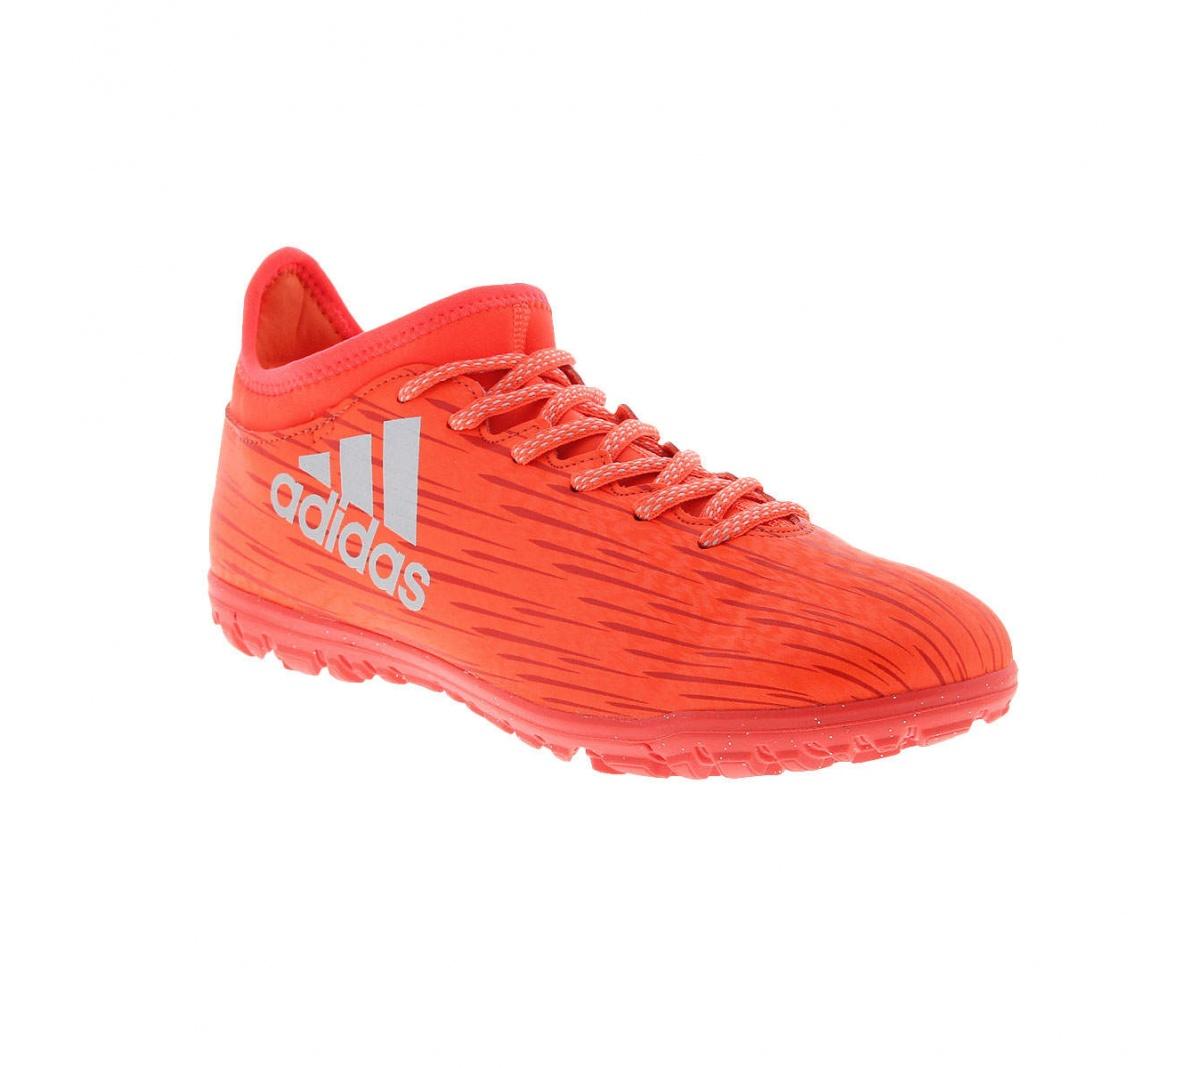 2c39c65a63 Chuteira Adidas X16.3 TF - Mundo do Futebol